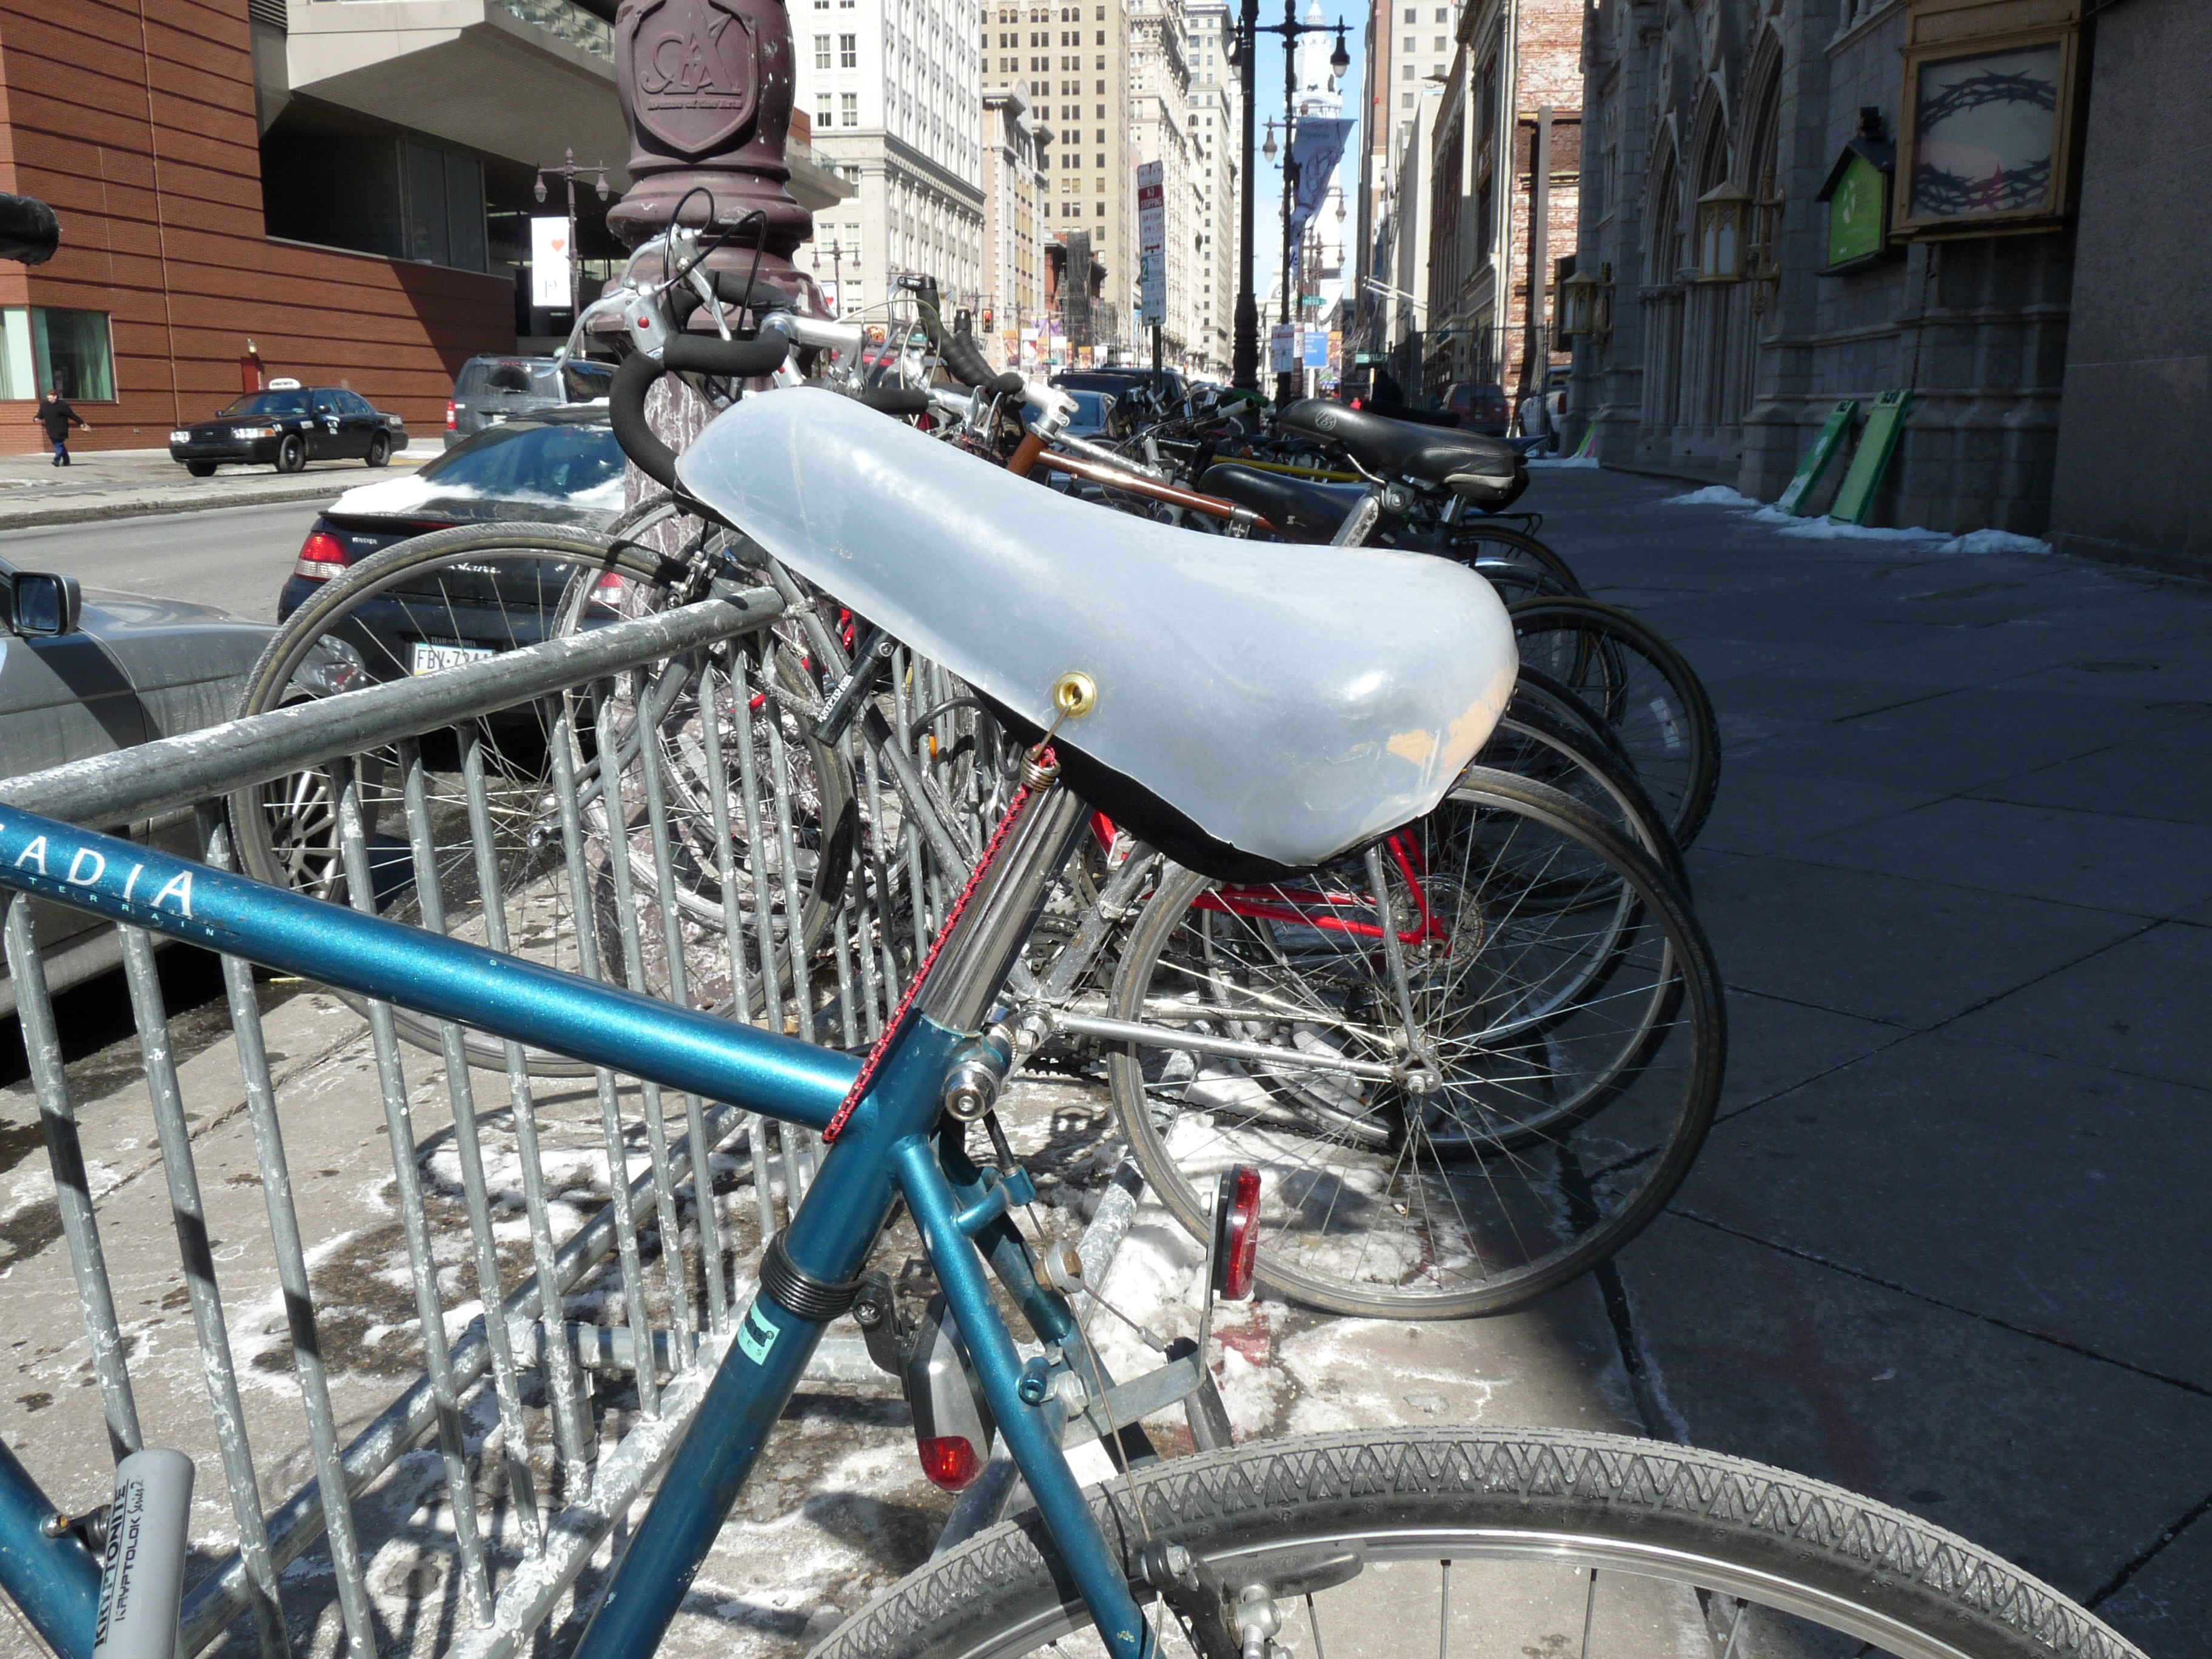 Bicycle Seat Condom